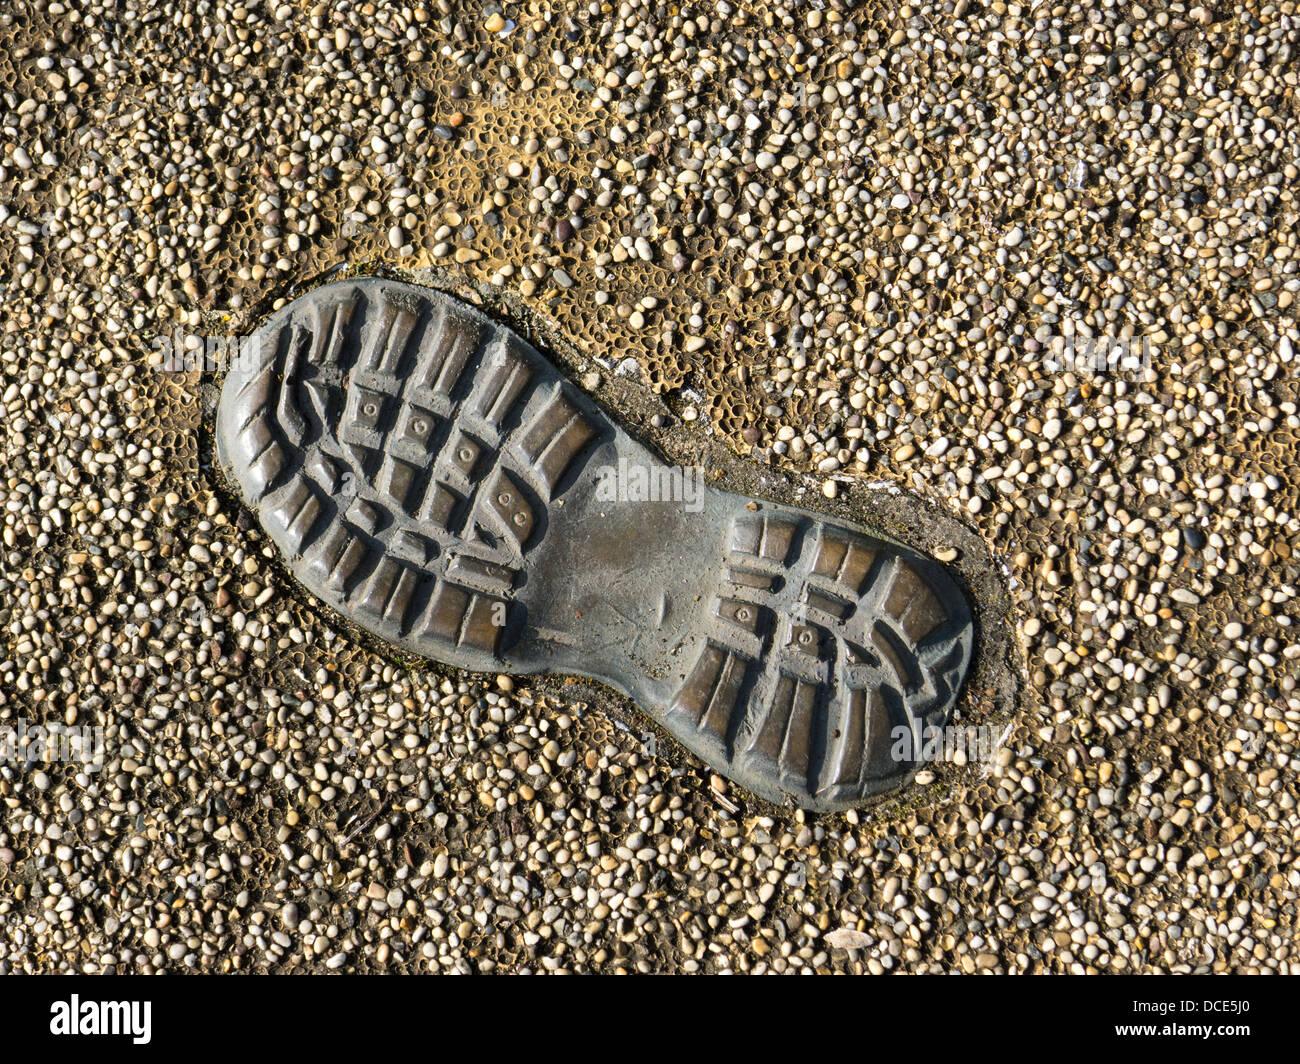 Footprint sculpture - Stock Image